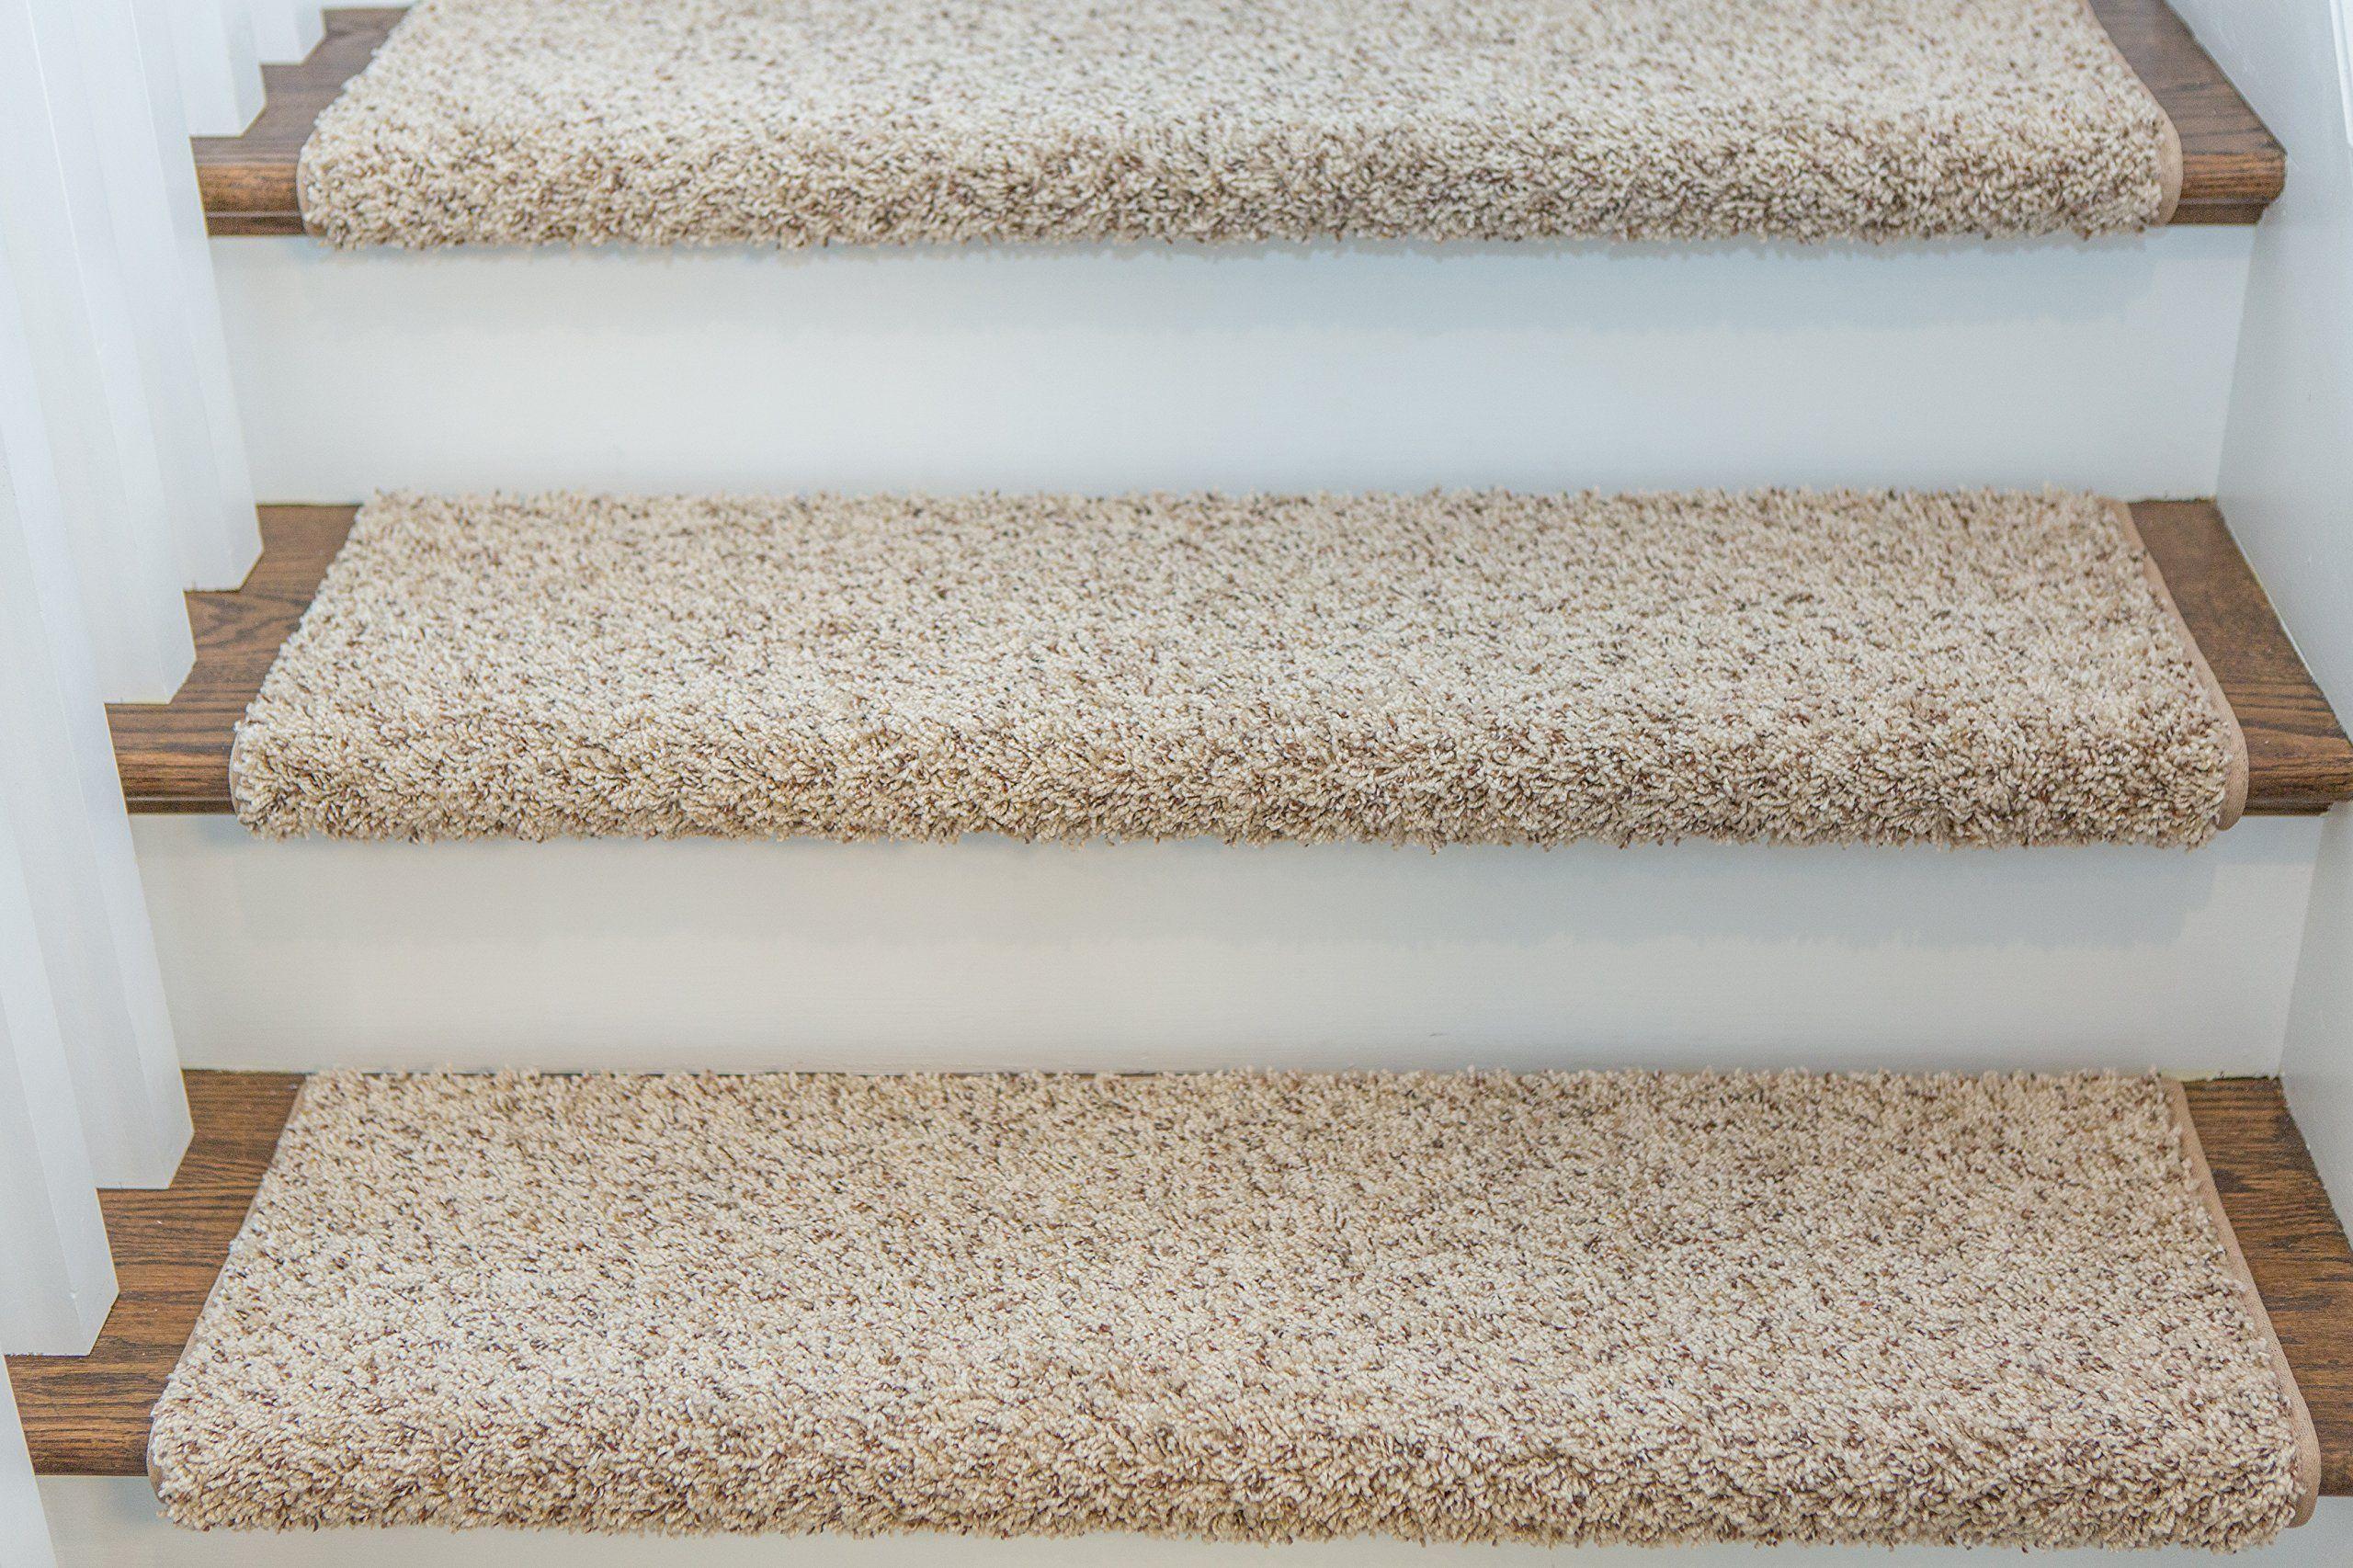 Amazon Com Windsor Adhesive Bullnose Carpet Stair Tread With | Single Carpet Stair Treads | Stair Runner | Adhesive Padding | Wood | Sisal Stair | Non Slip